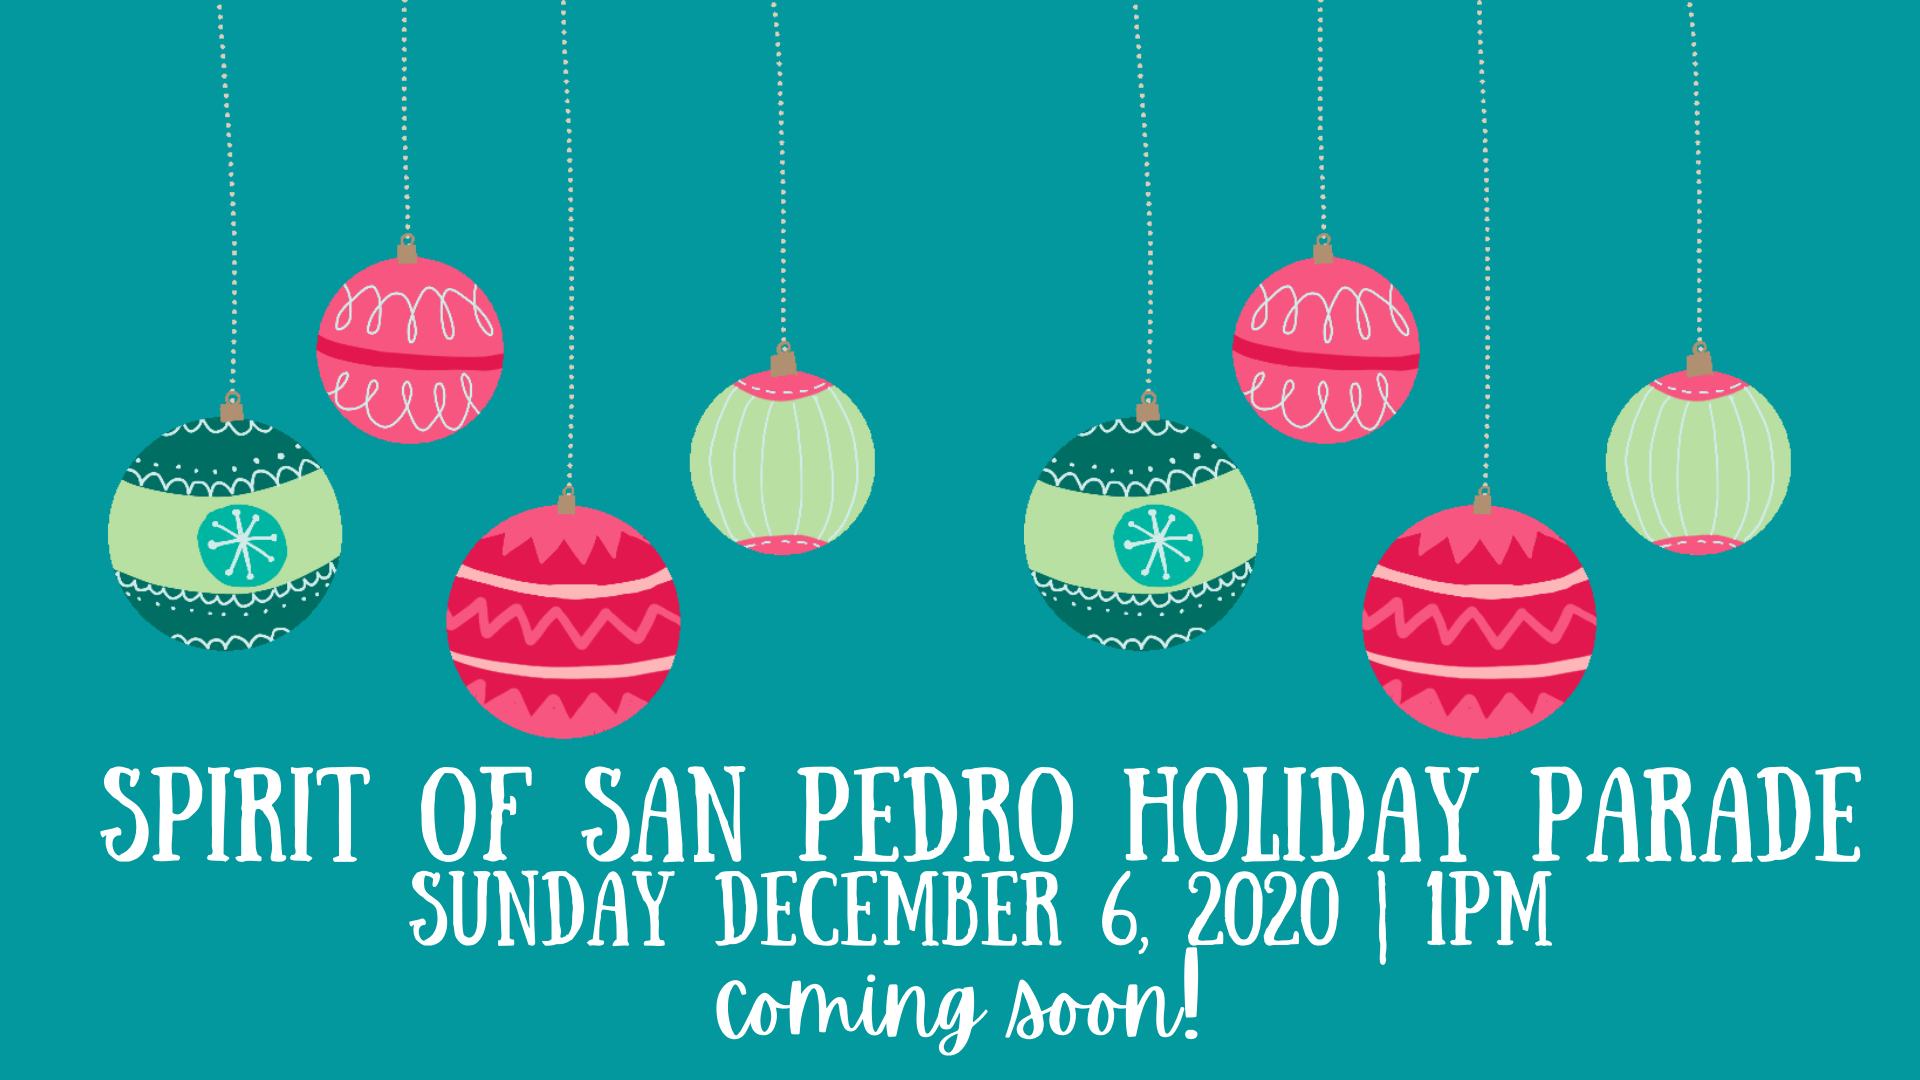 Spirit-of-San-Pedro-Holiday-Parade-Sunday-December-6.-2020-_-1pm(1).png